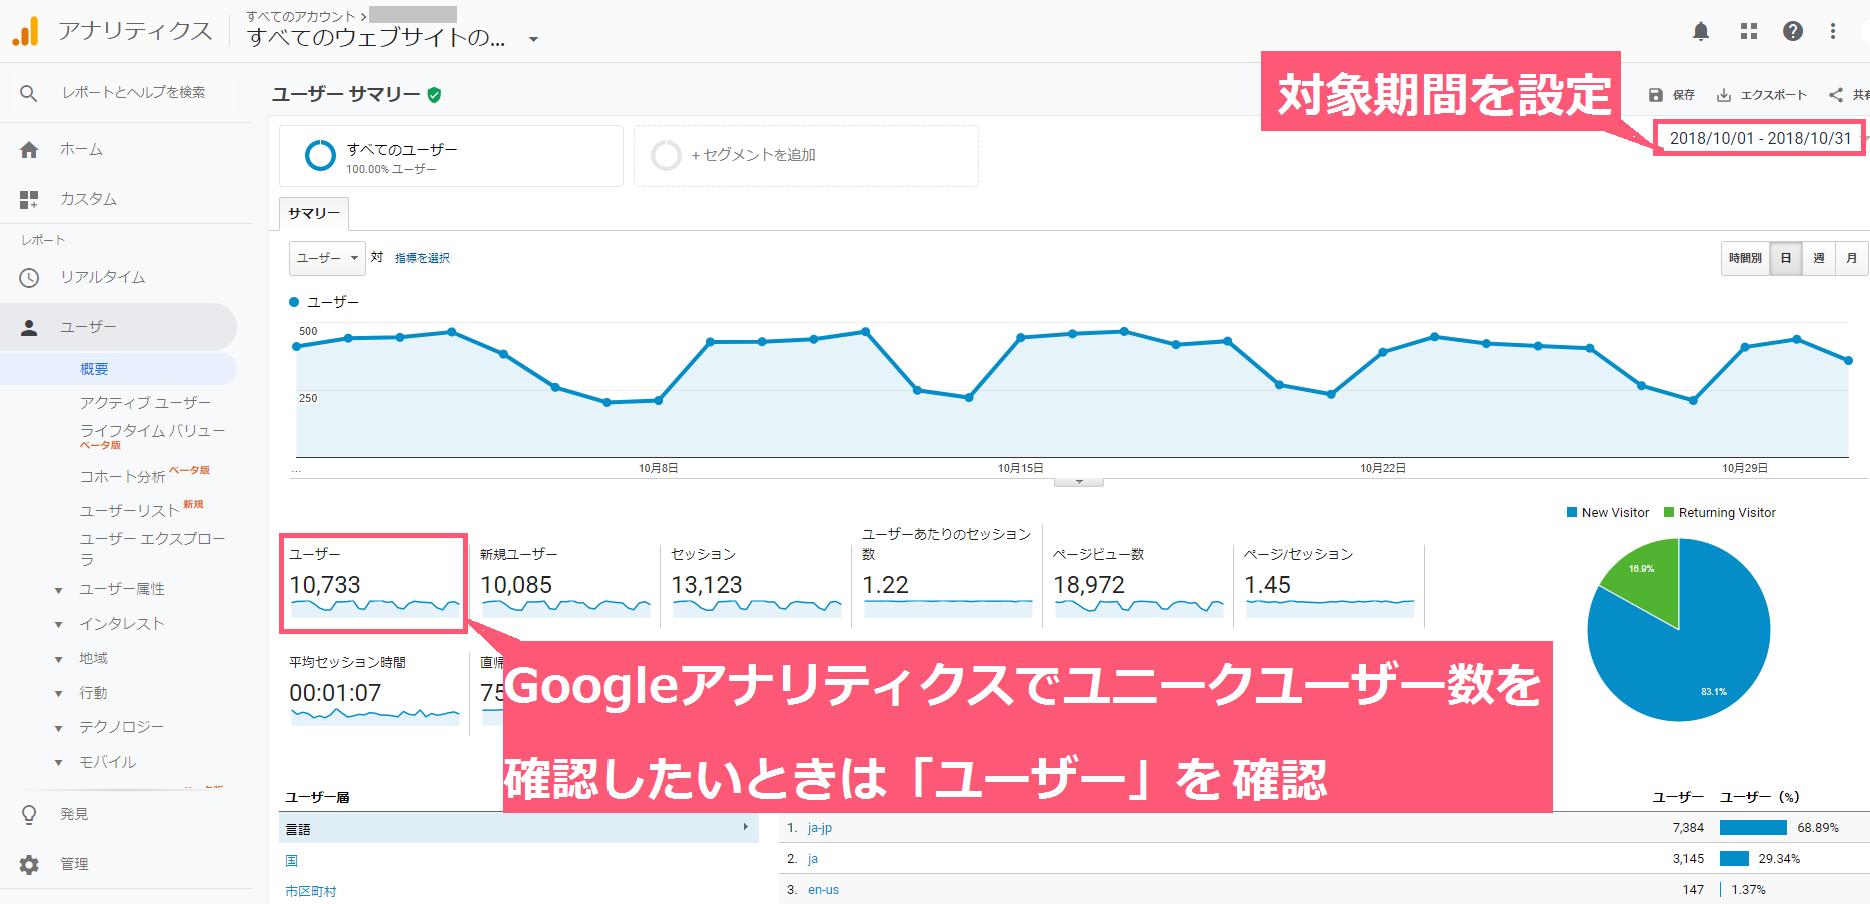 Googleアナリティクスのユーザー確認画面